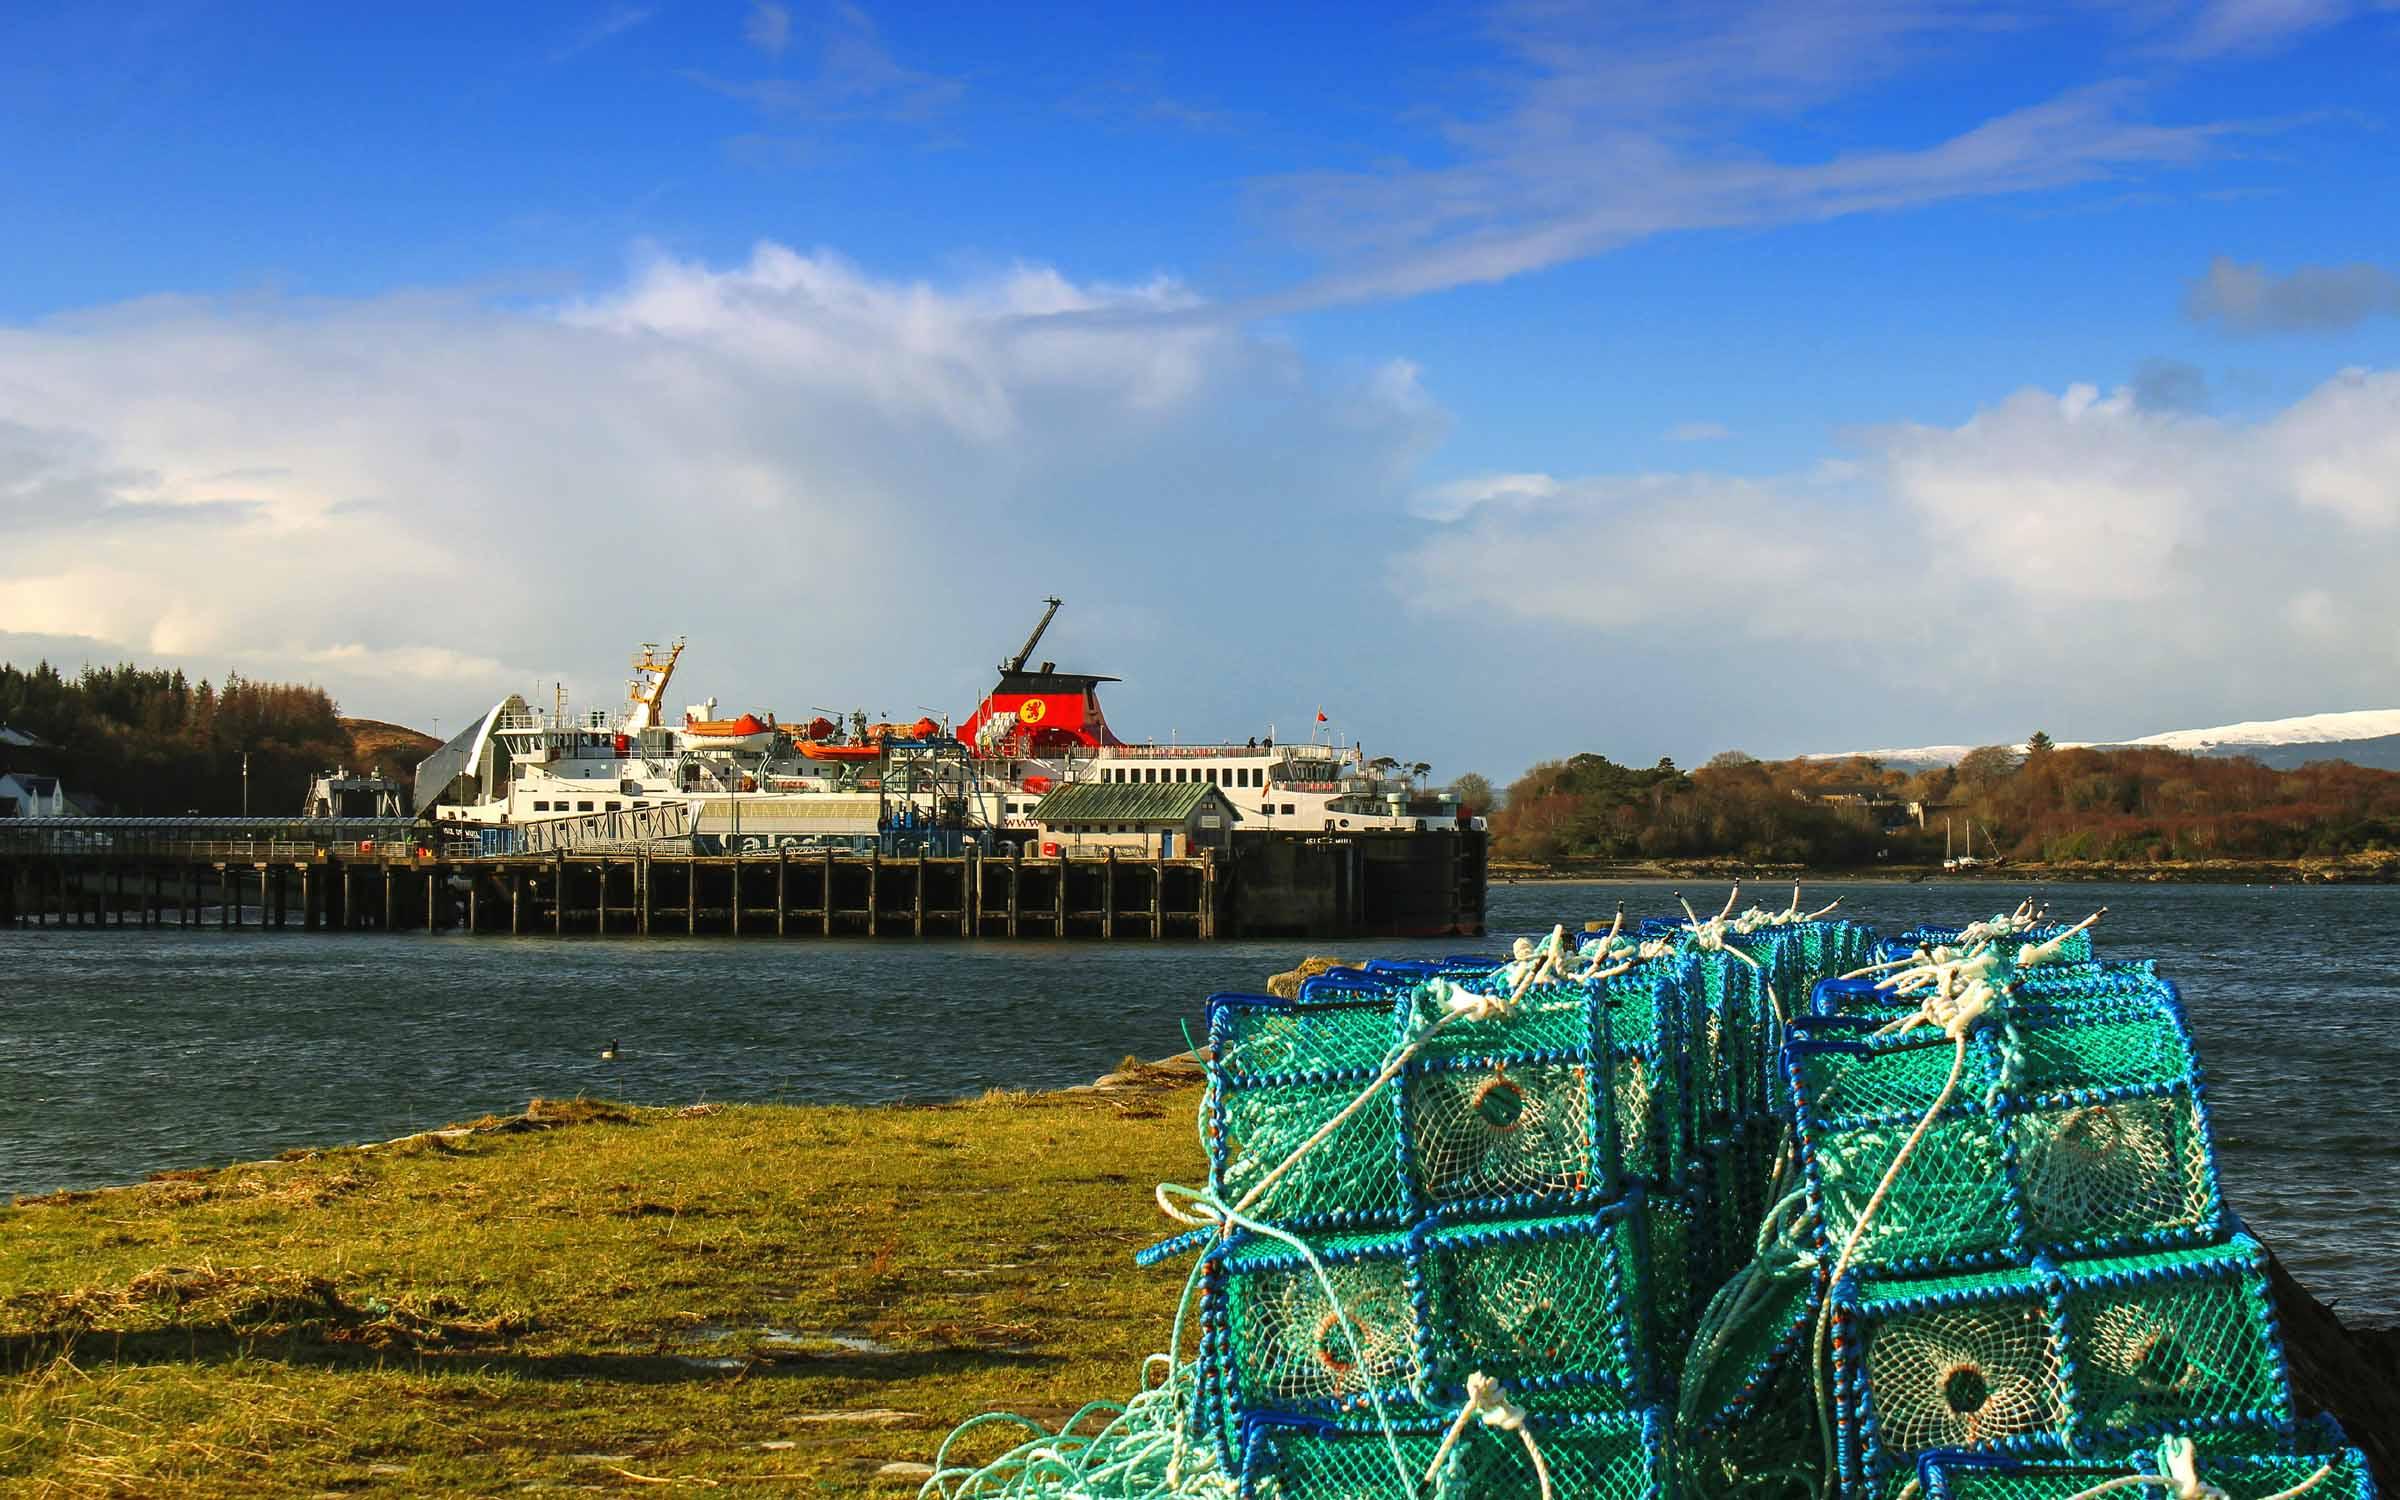 Isle of Mull at Craignure (Ships of CalMac)